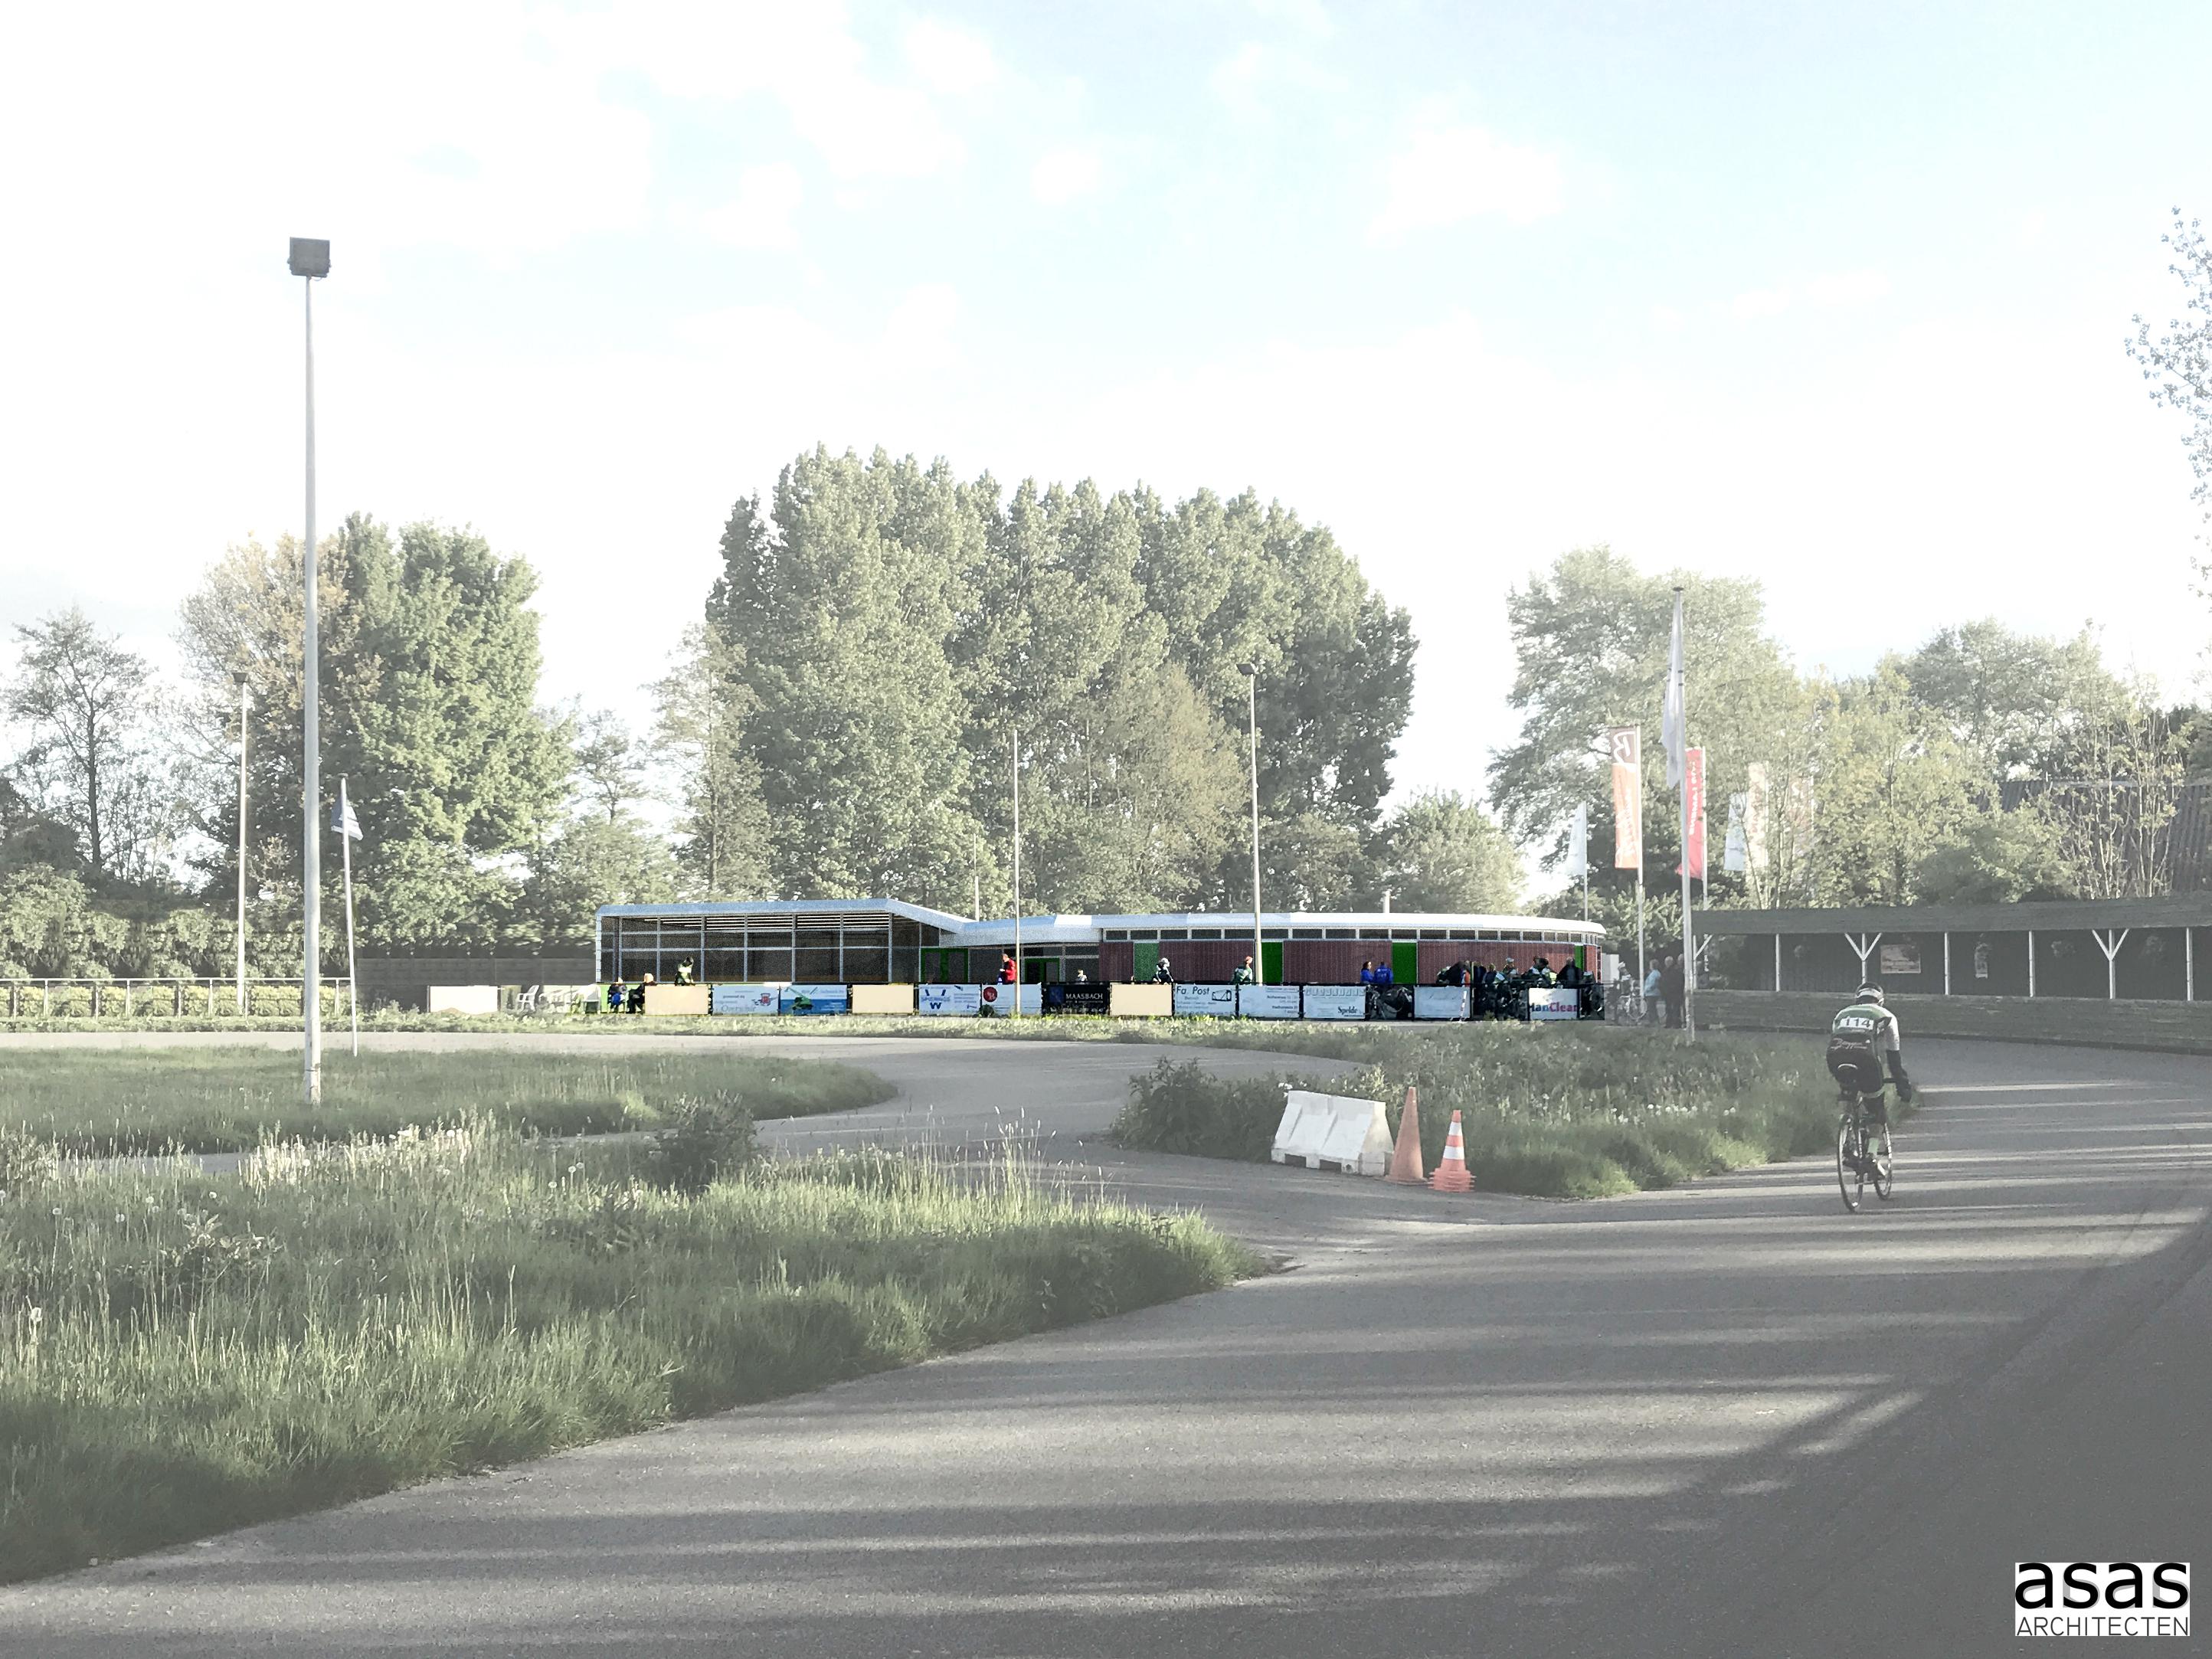 <p>Trainingsruimte RWC Ahoy Rotterdam, ASAS Architecten</p>